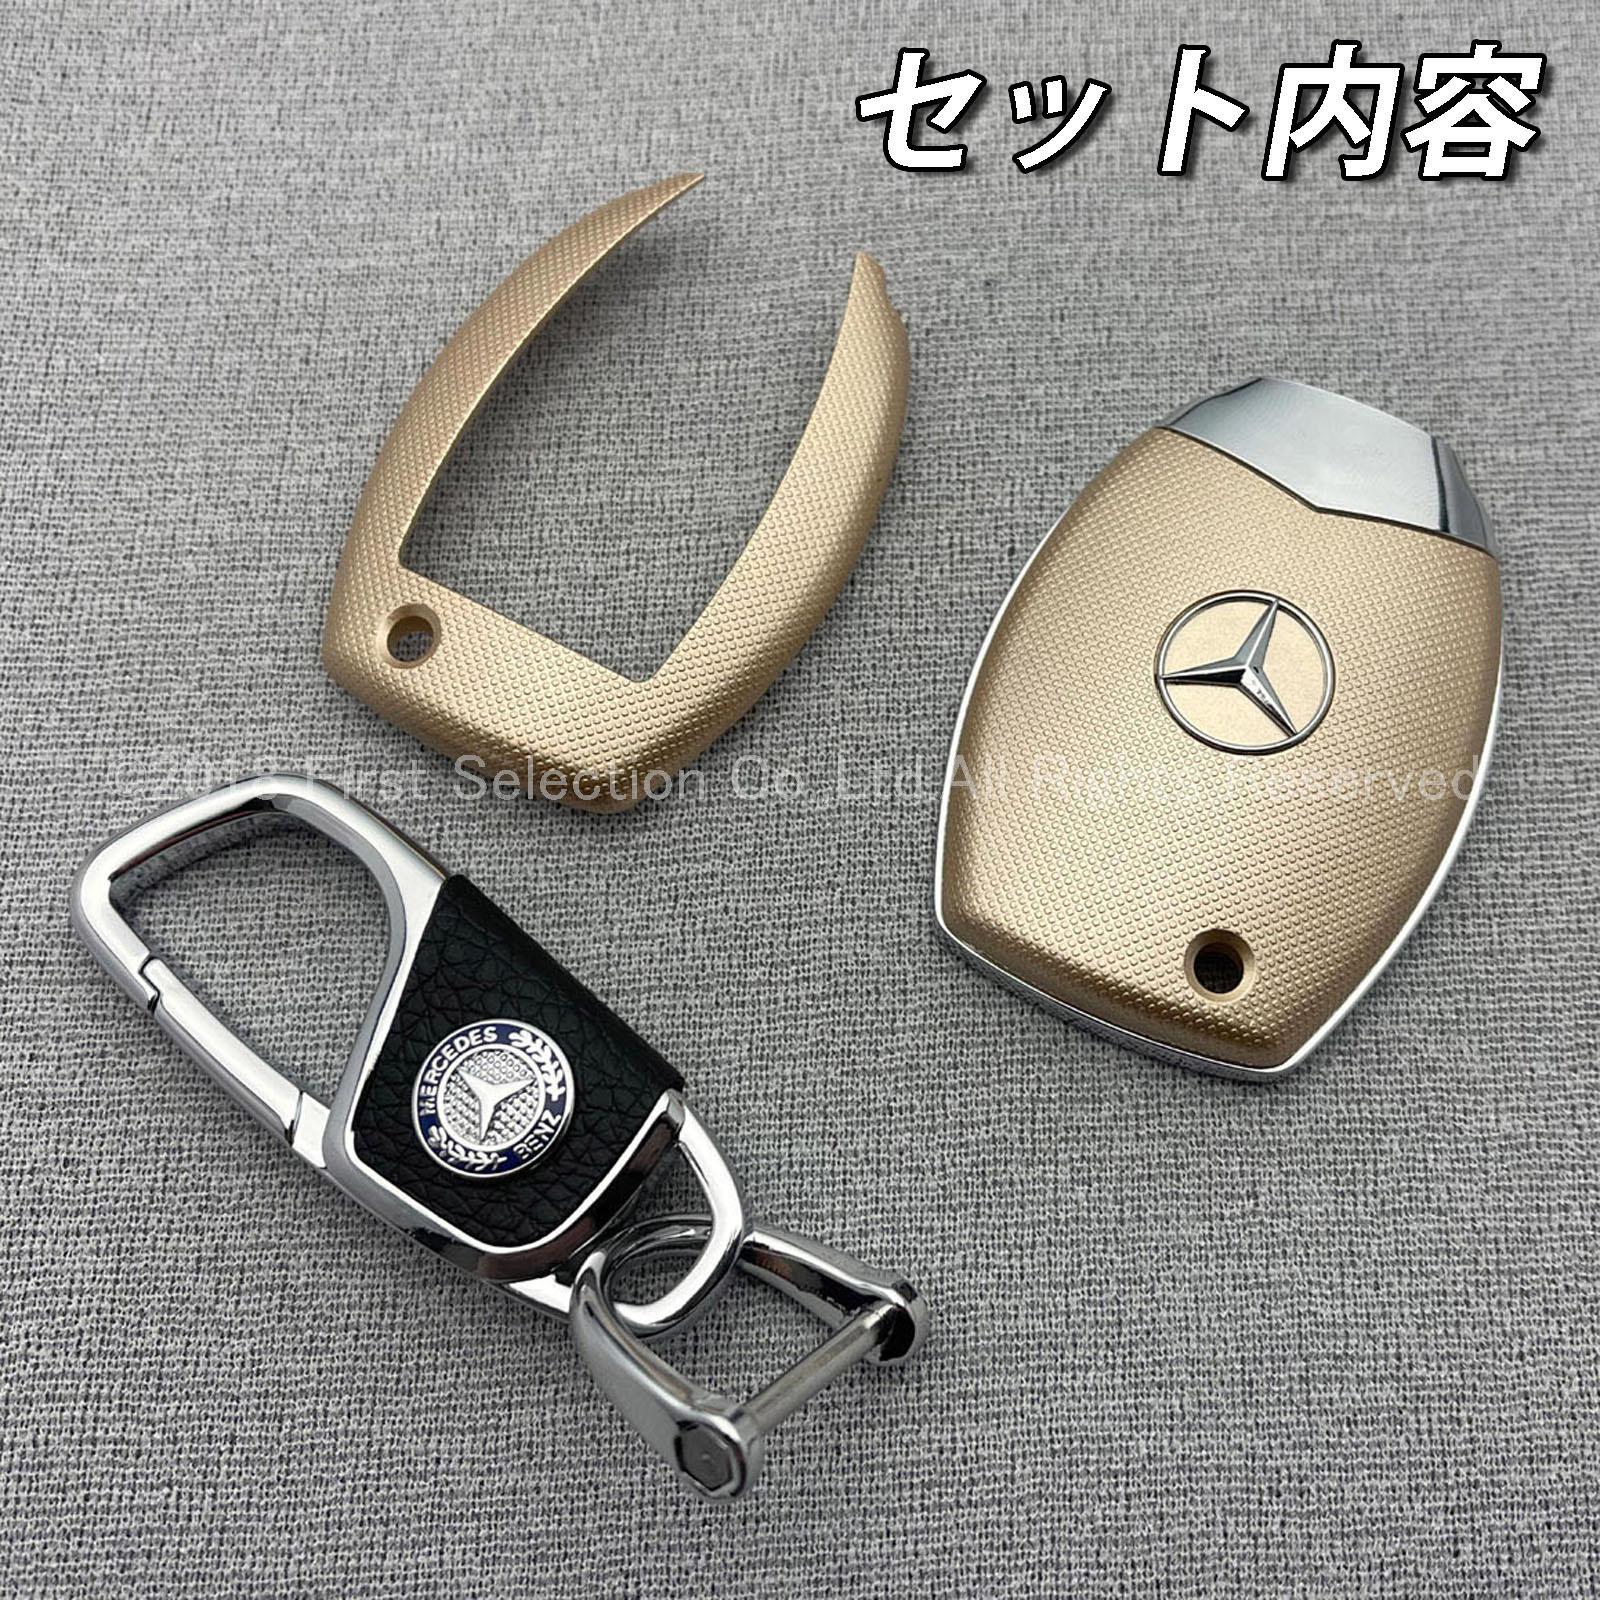 Mercedes-Benz ベンツ スマートキー用 高級キーケースセット Y金シボ W176 W246 W205 W212 W222 W447 C117 C218 X156 X253 W166 X166